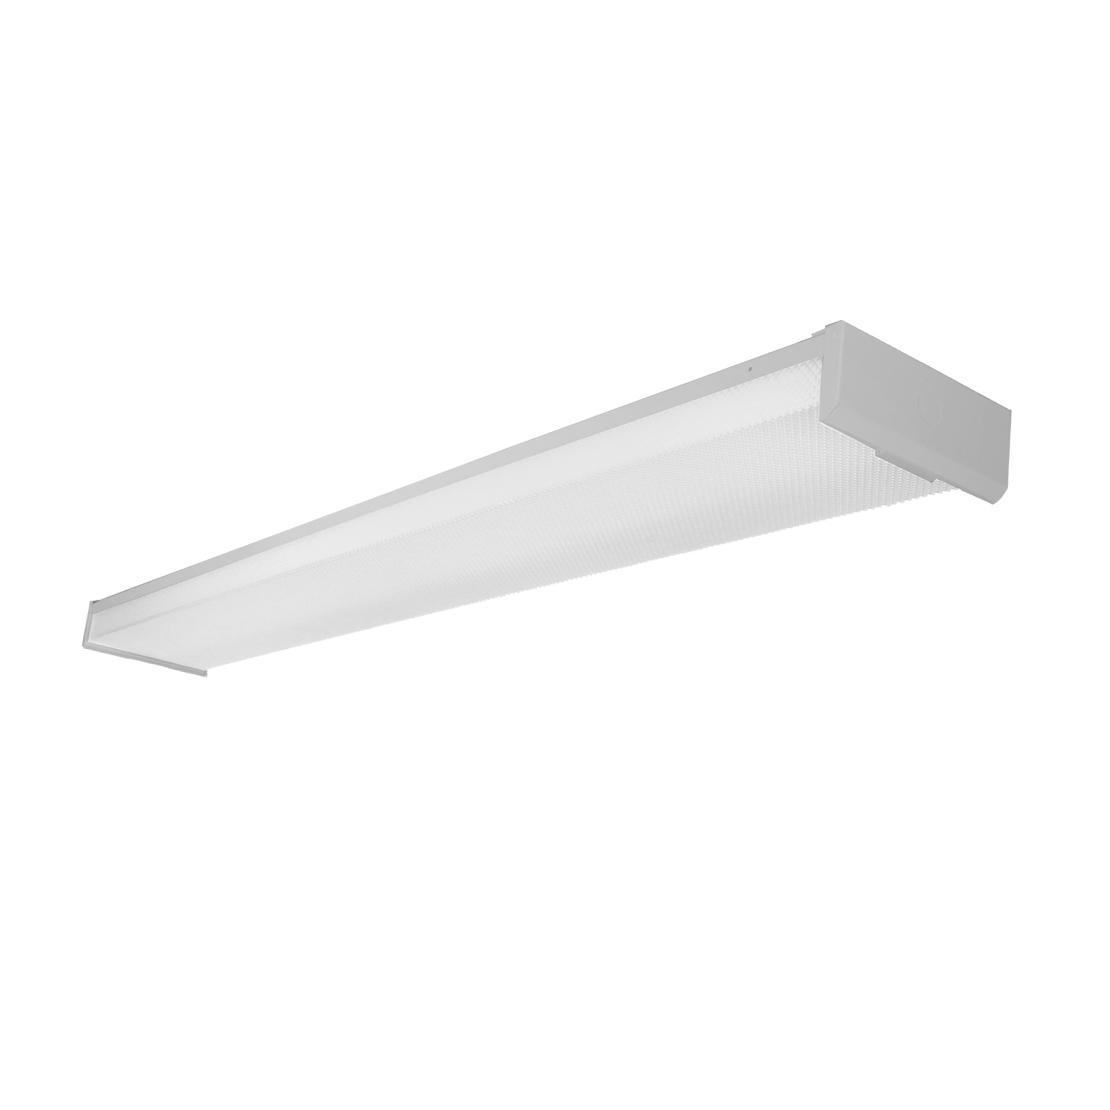 iBright Wrap Light